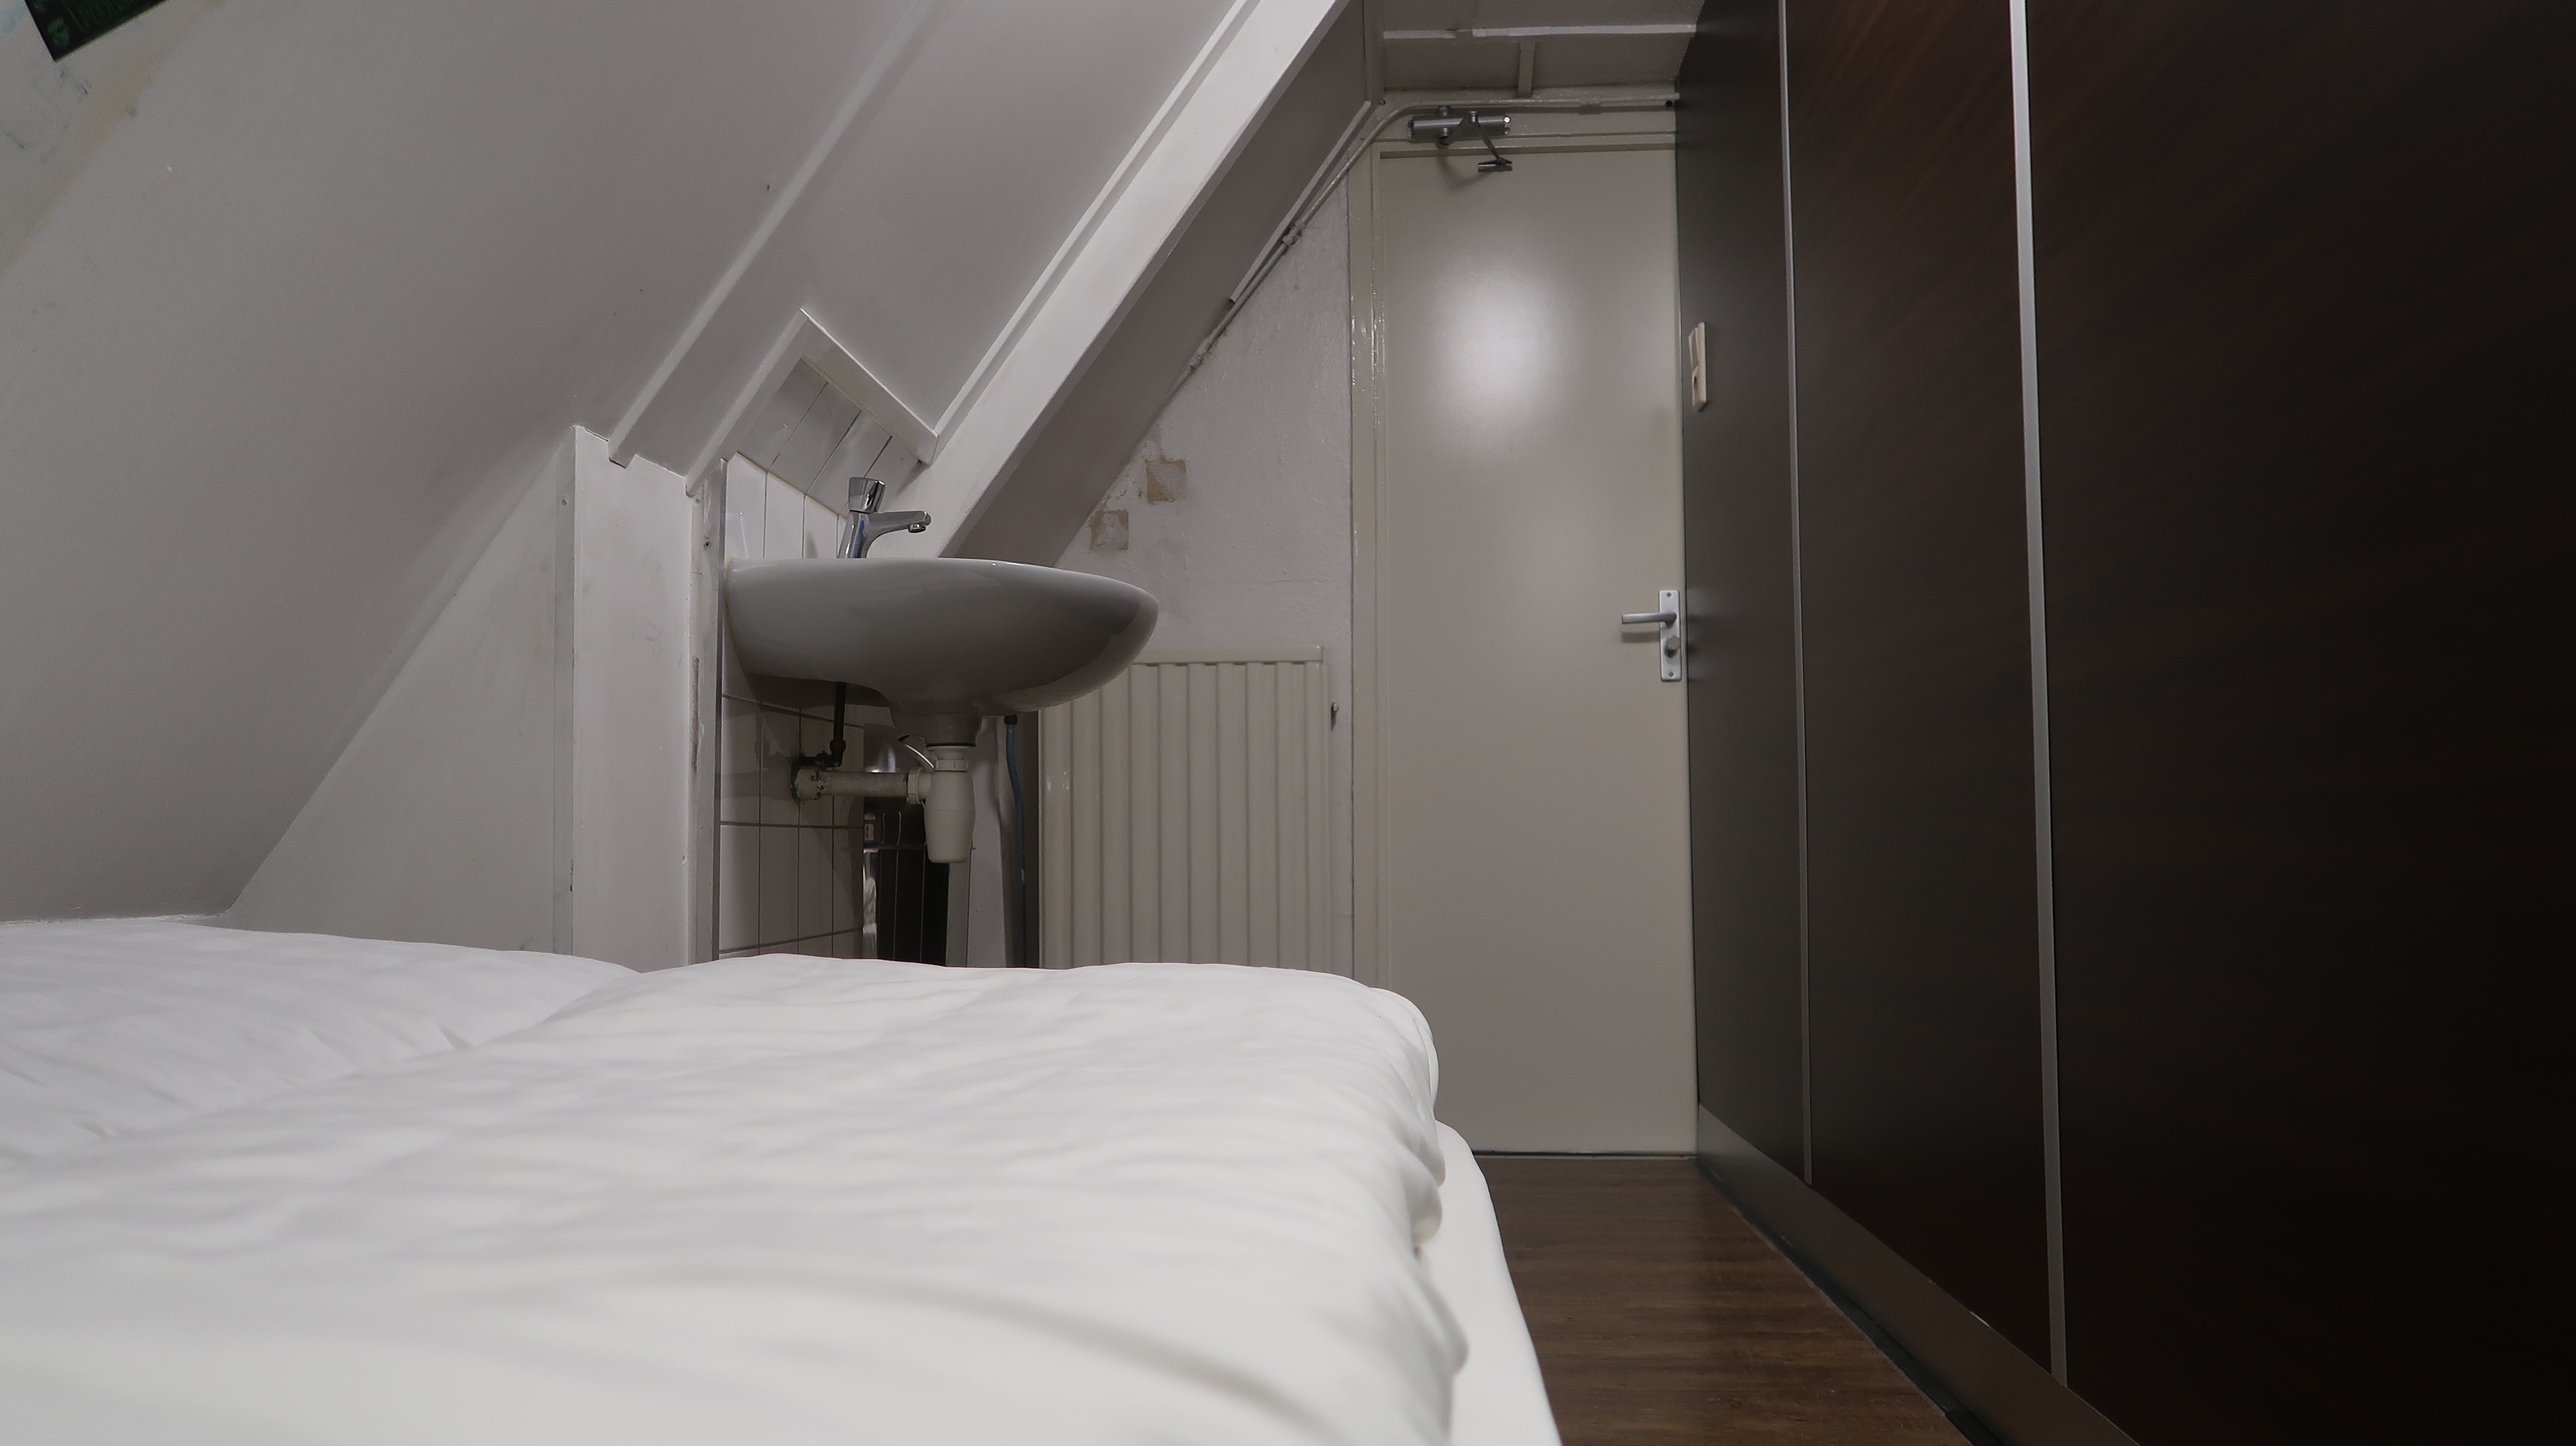 Hostel Utopia